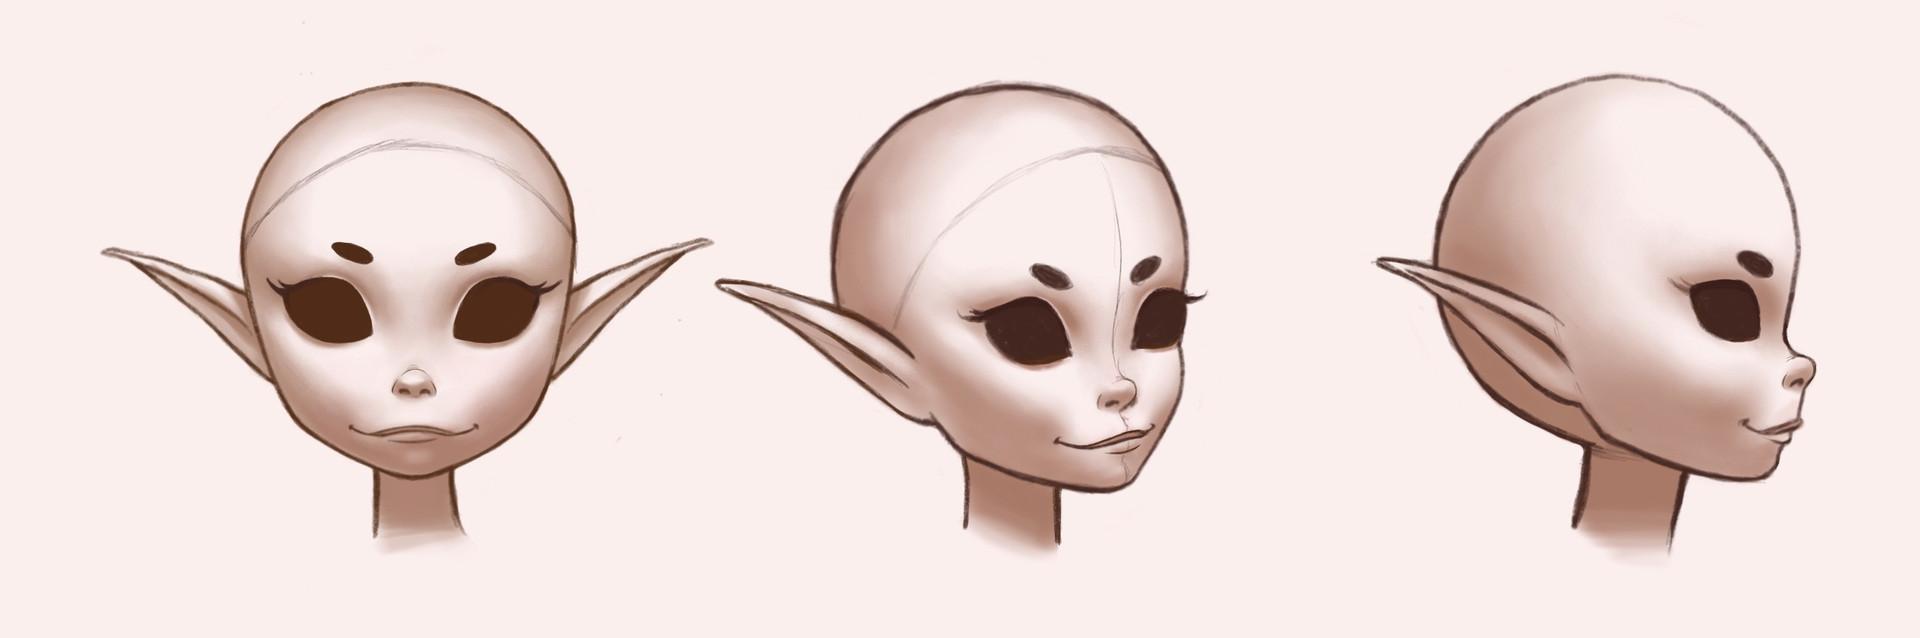 Doll head design